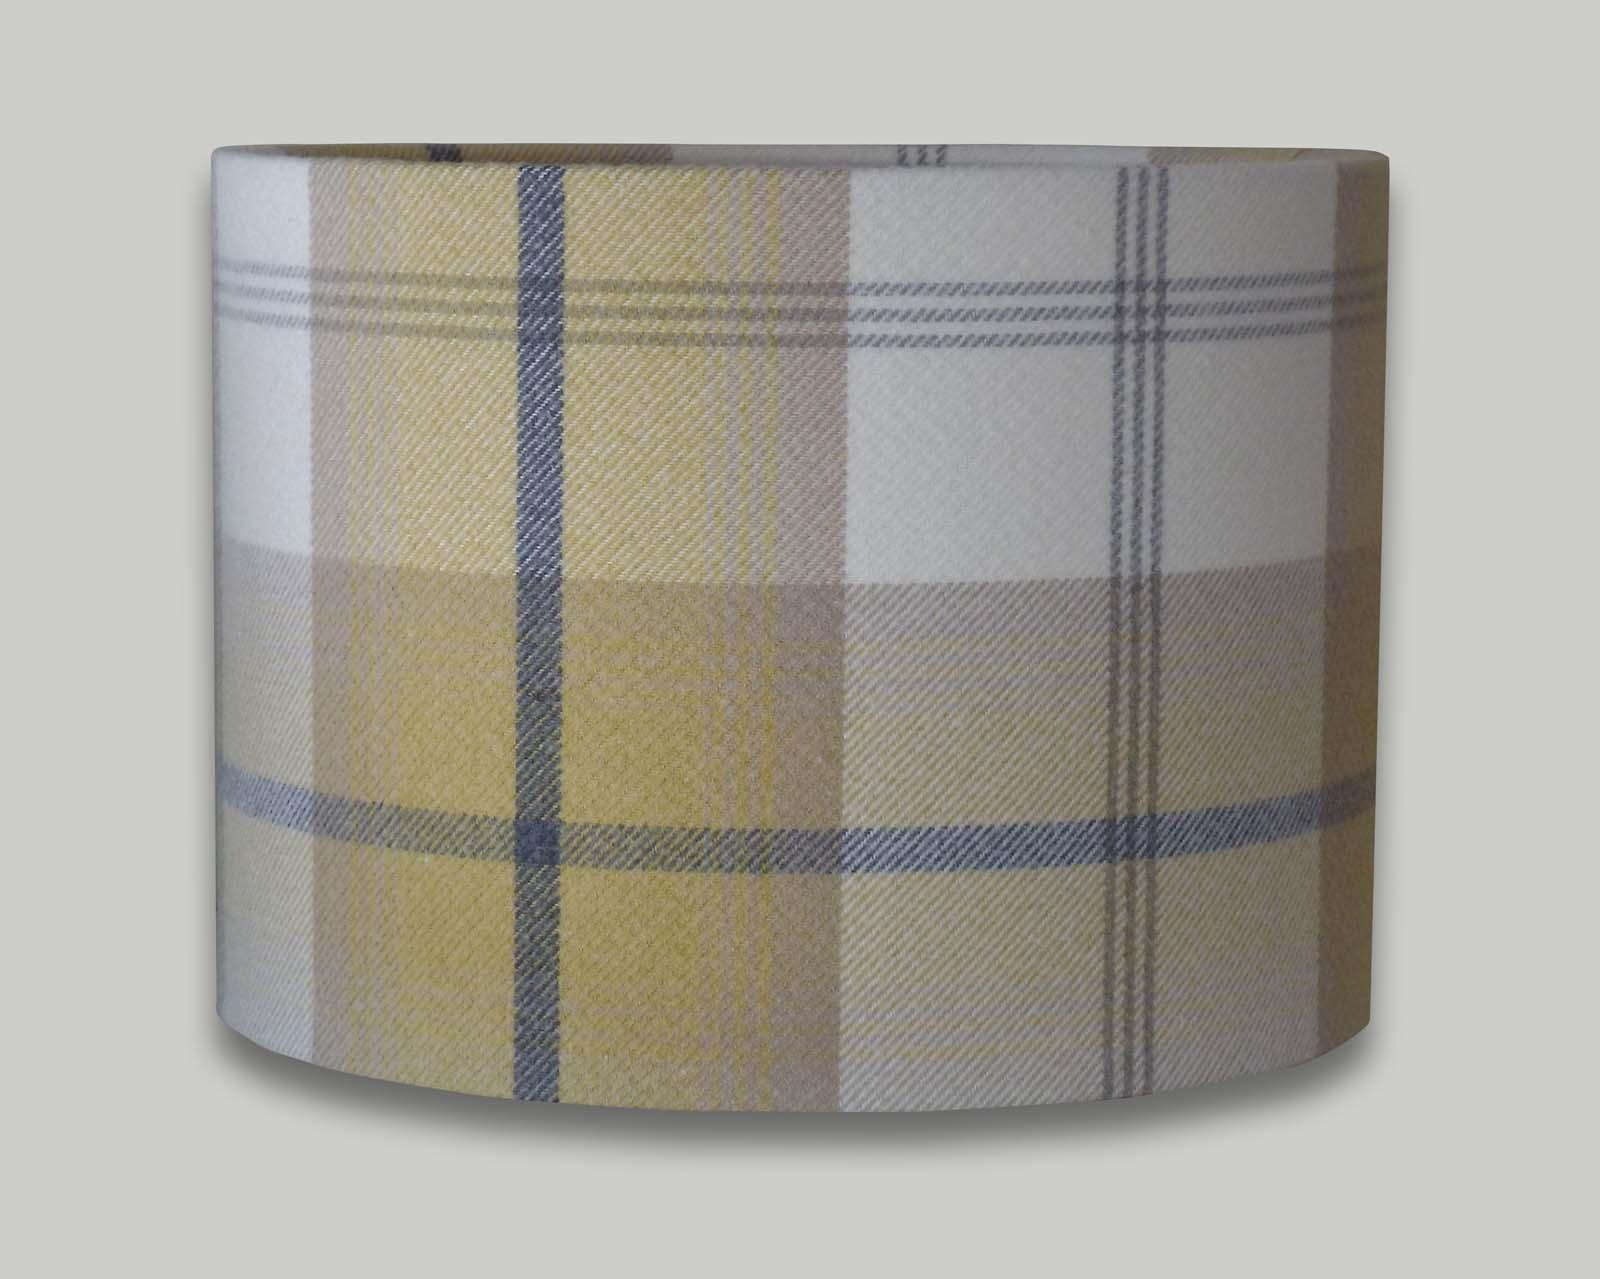 Balmoral Ochre Yellow Grey Tartan Check Tweed Drum